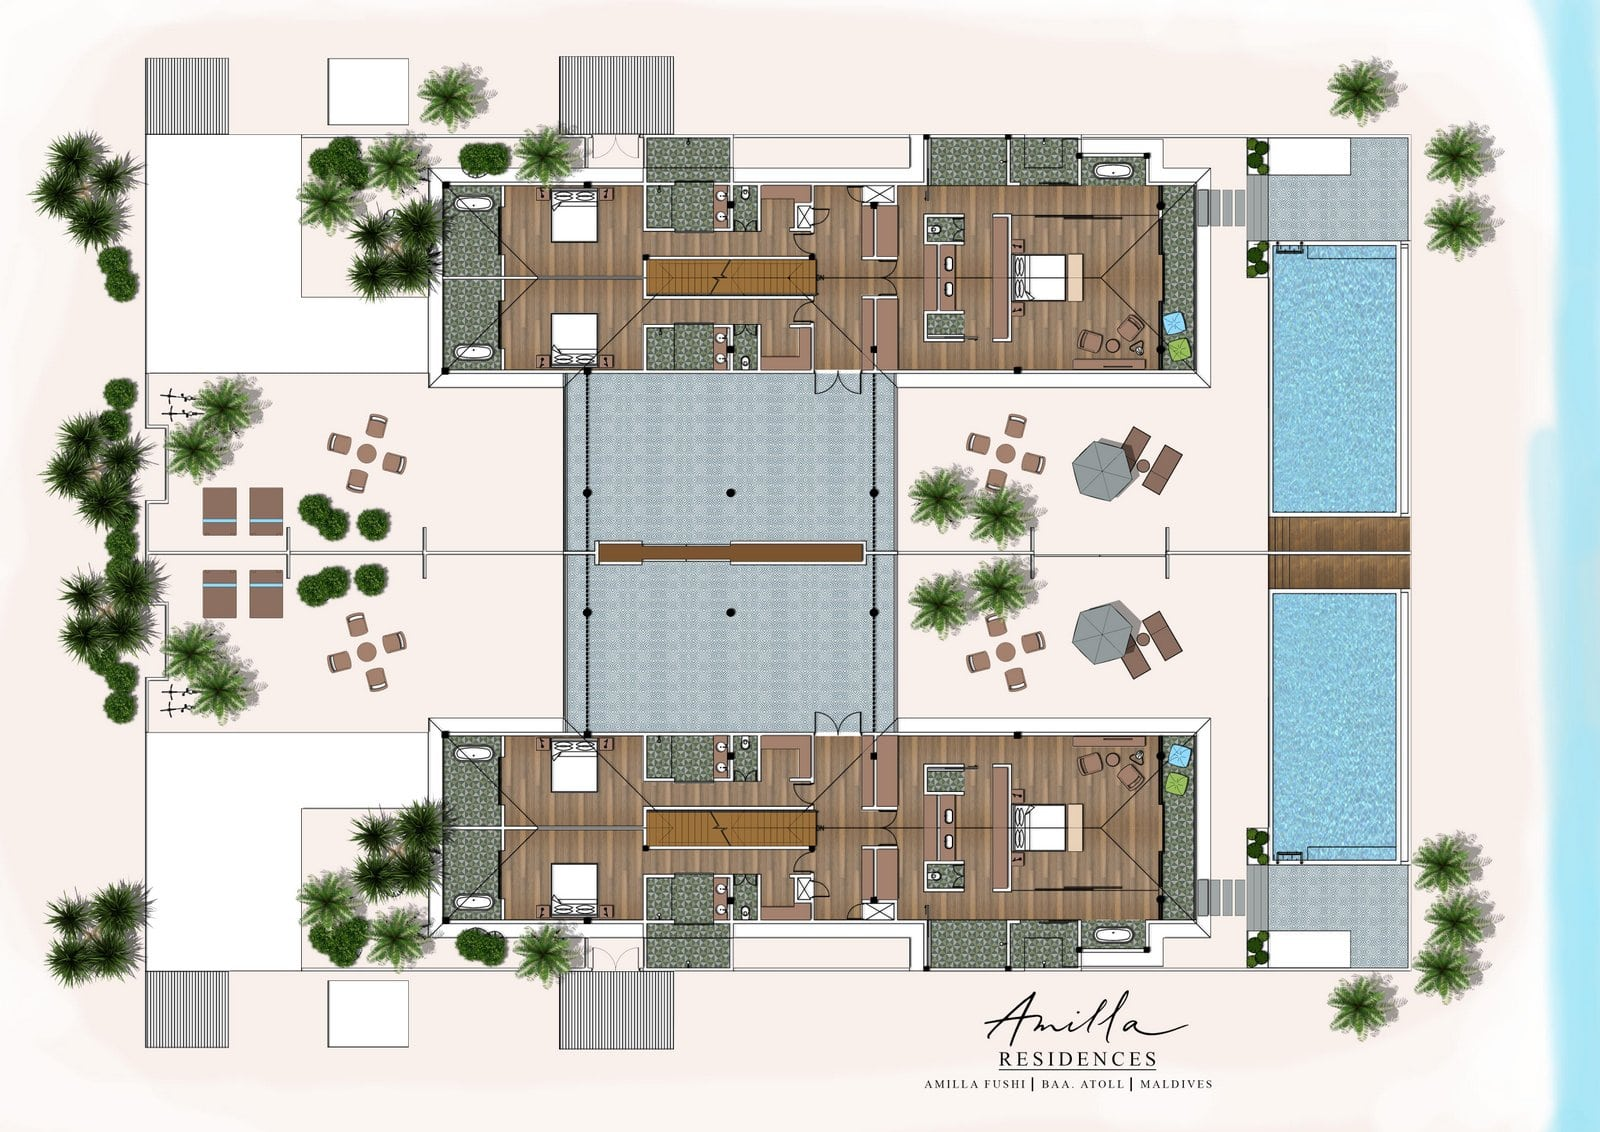 Мальдивы, Отель Amilla Fushi Maldives, план-схема номера The Great Beach Residence